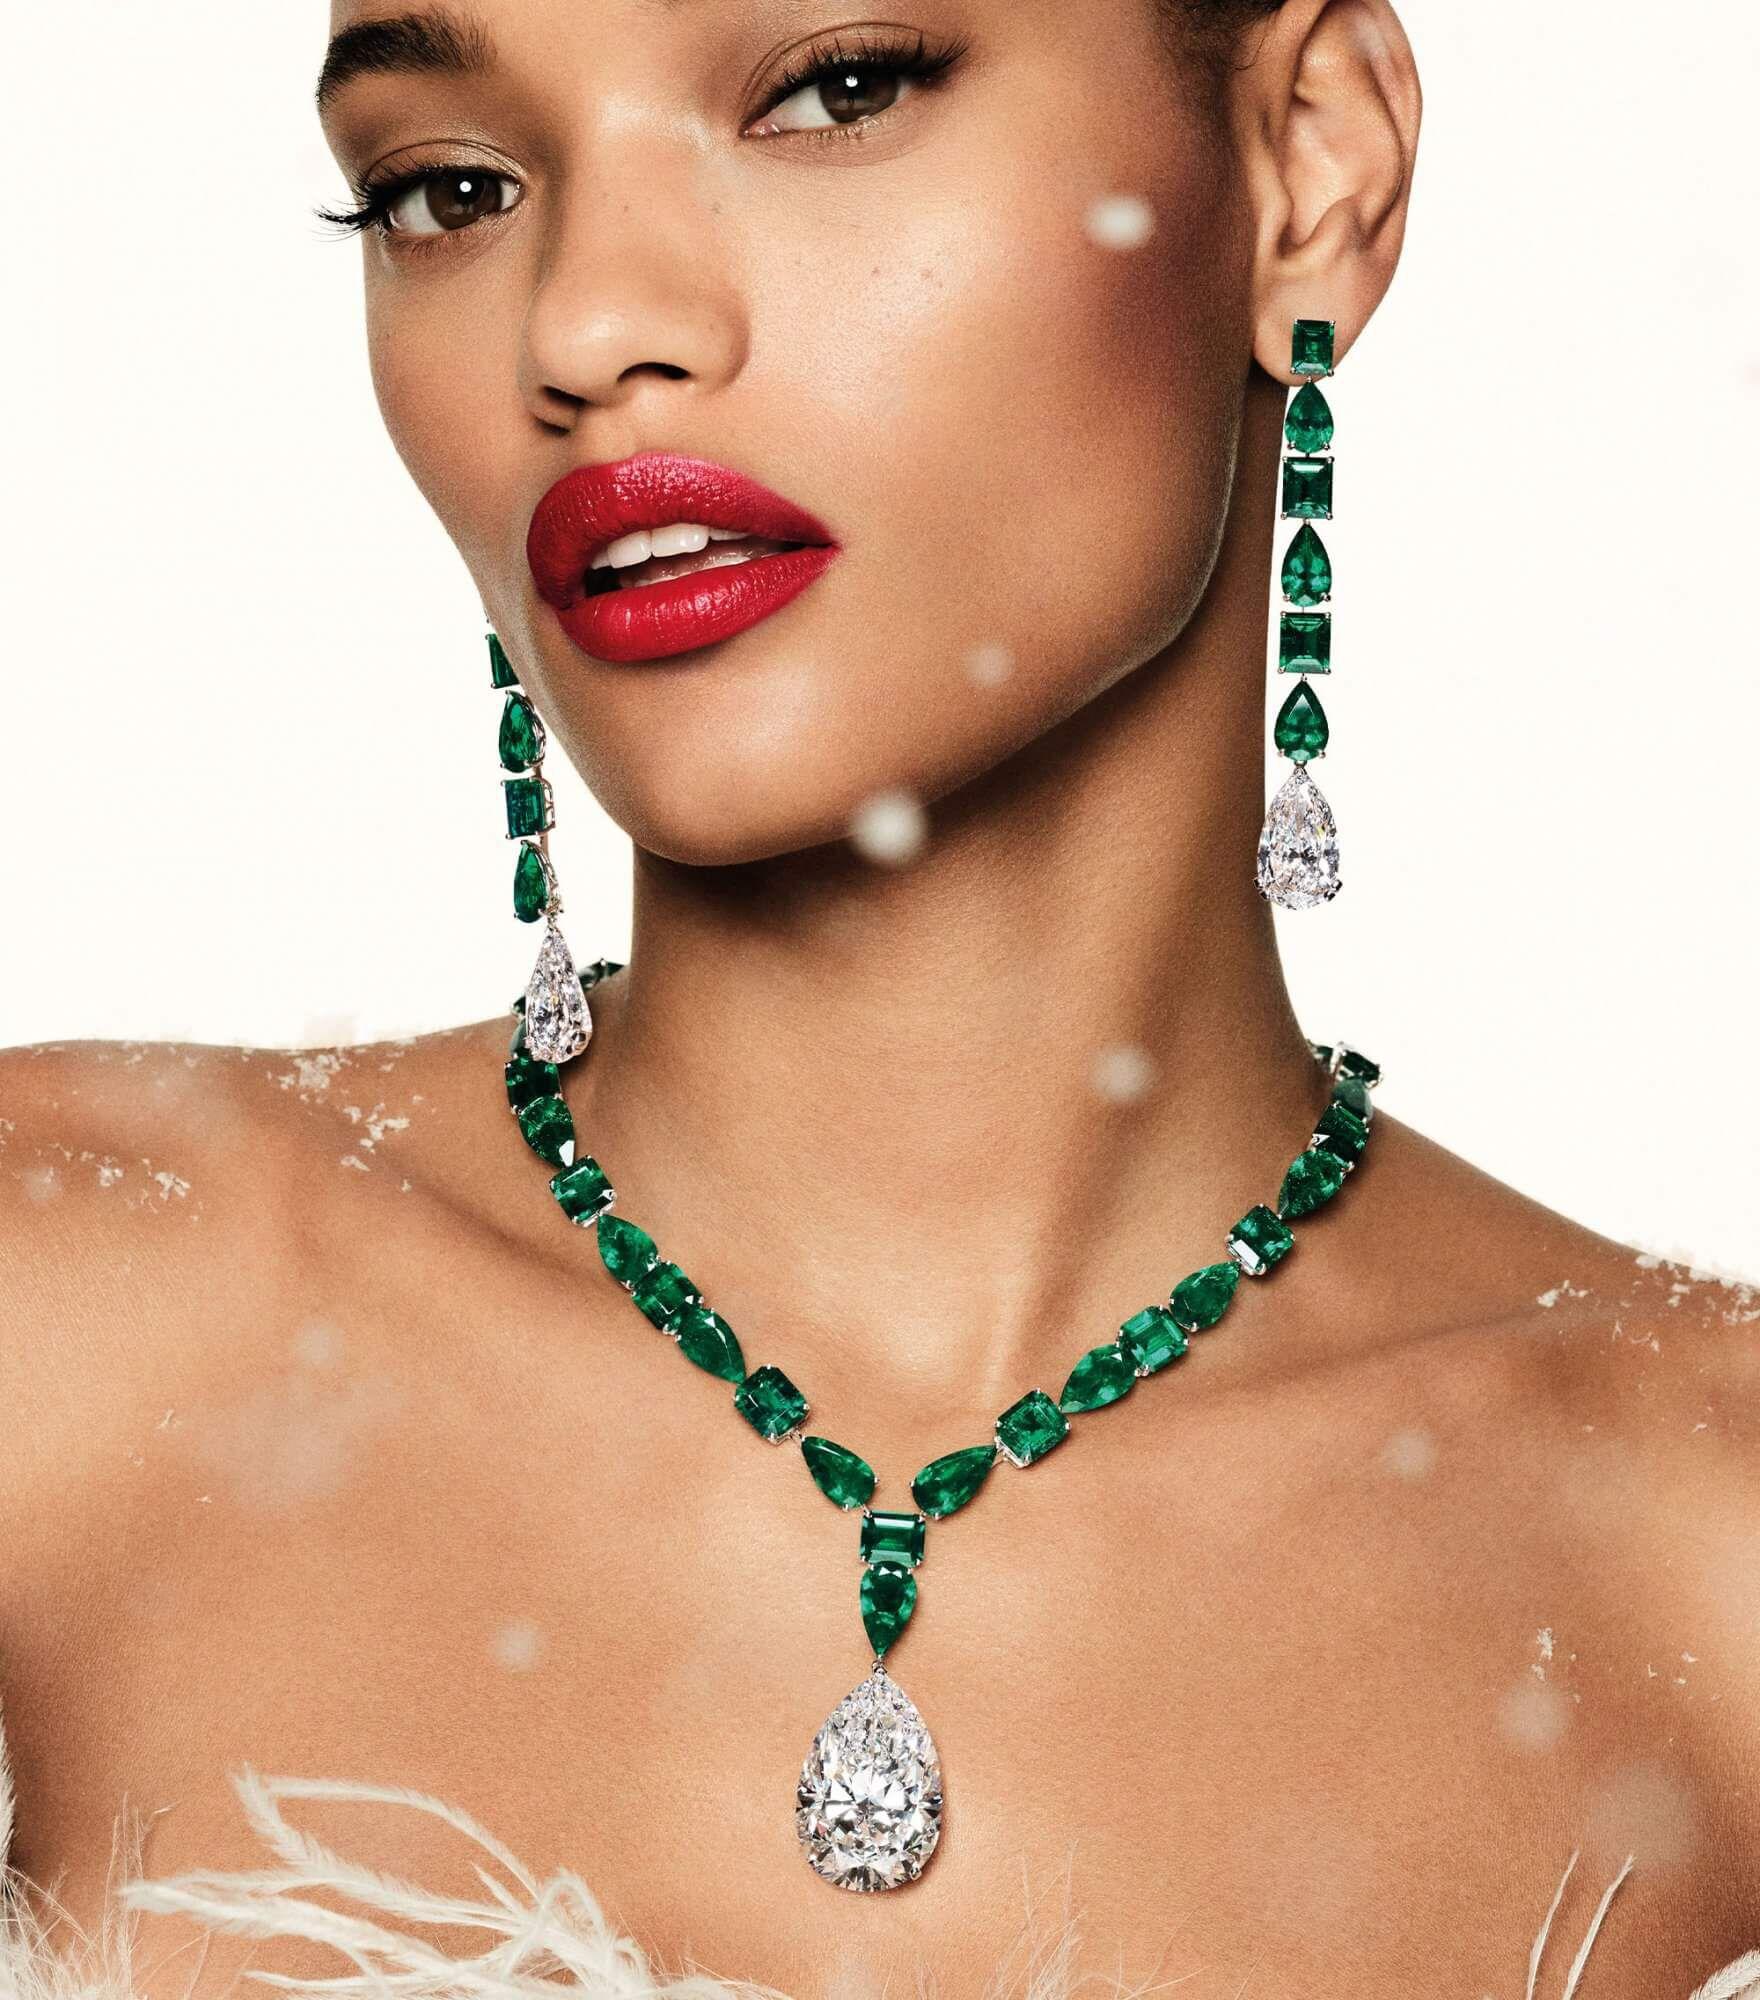 A model wearing Graff emerald and white diamond high jewellery